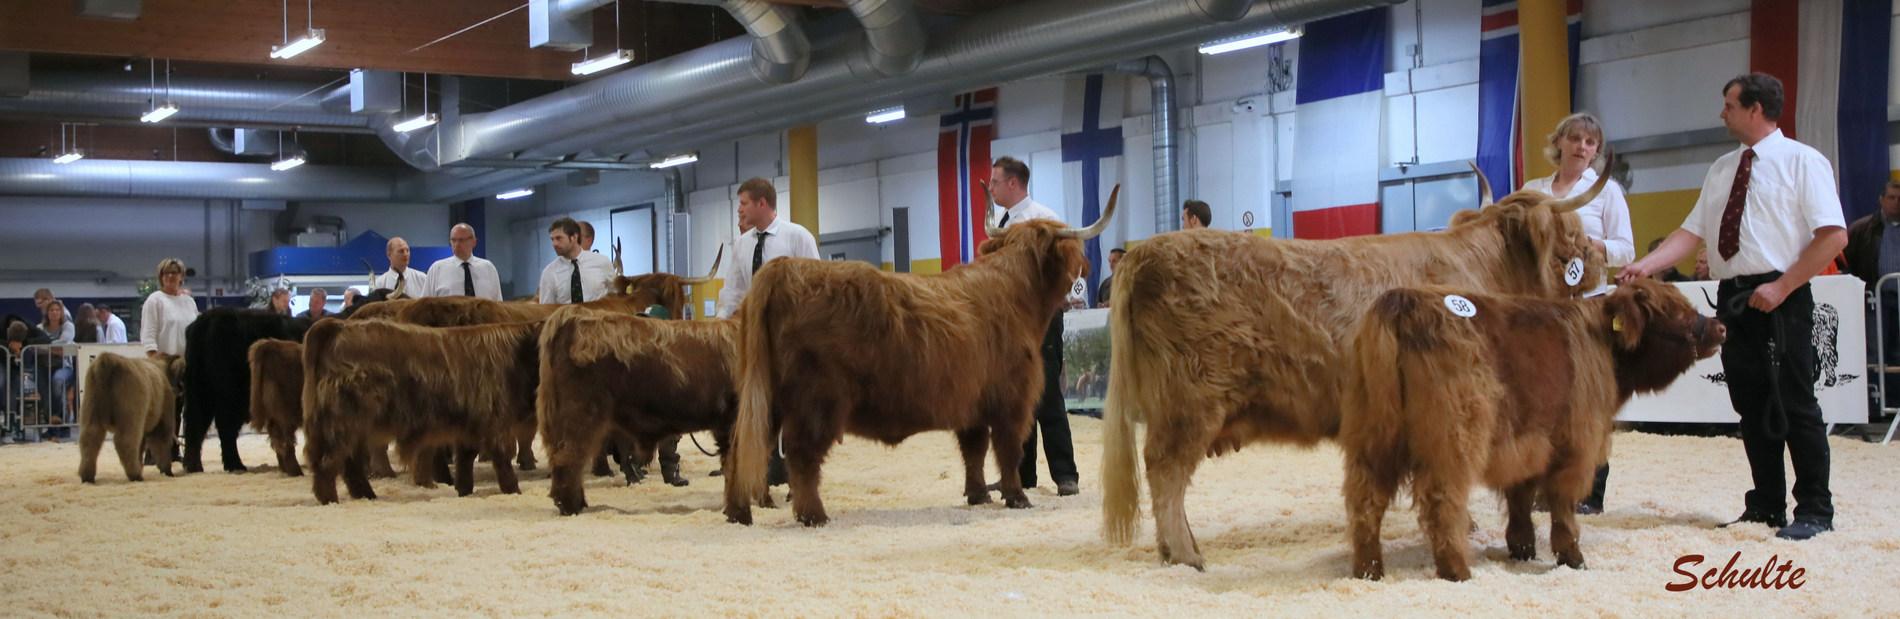 280 Kühe mit Kalb bei Fuss Klasse 5